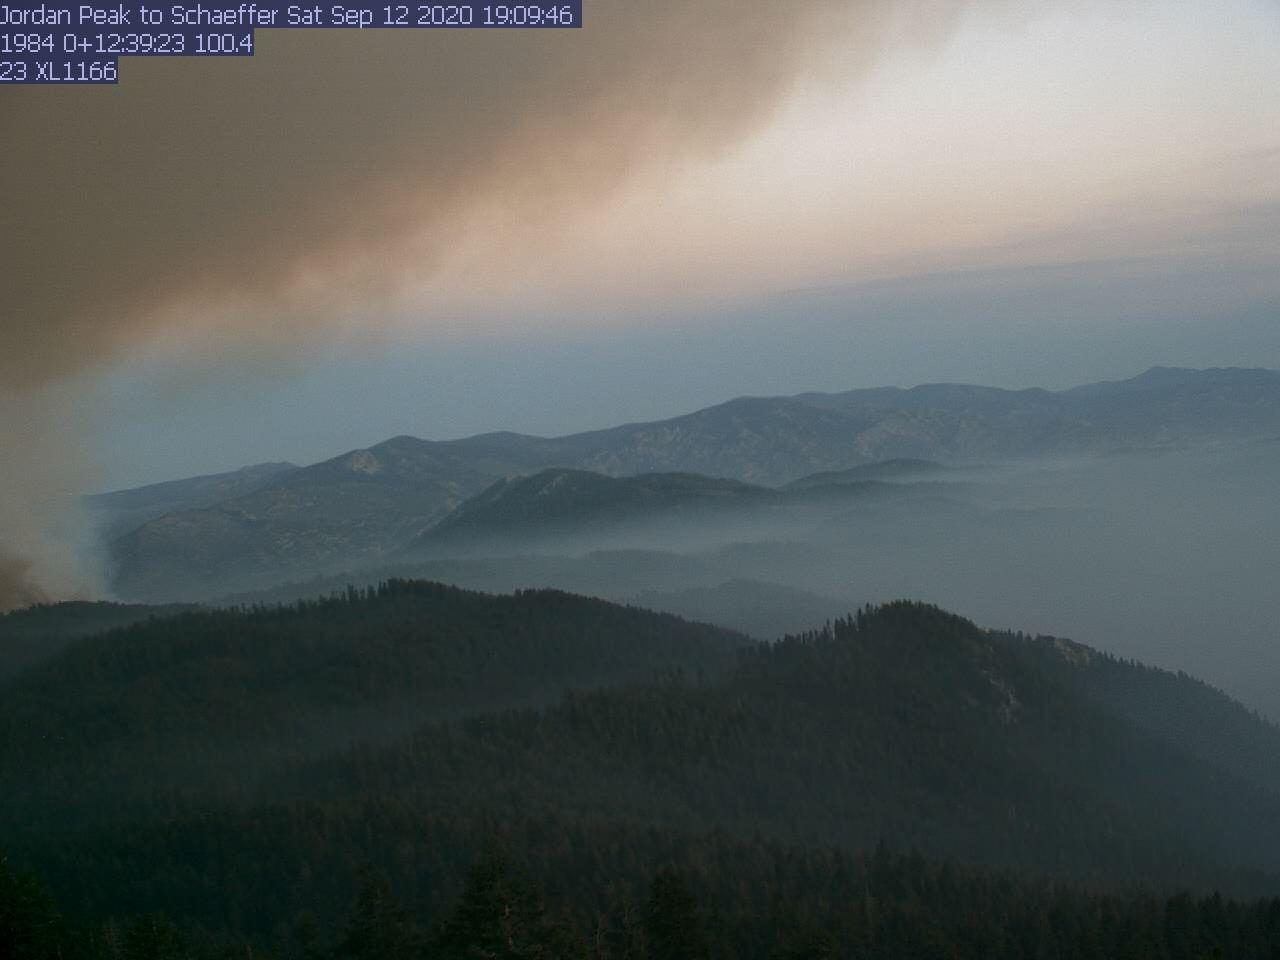 Jordan Peak WebCam #3 - Southeast to Needles Lookout